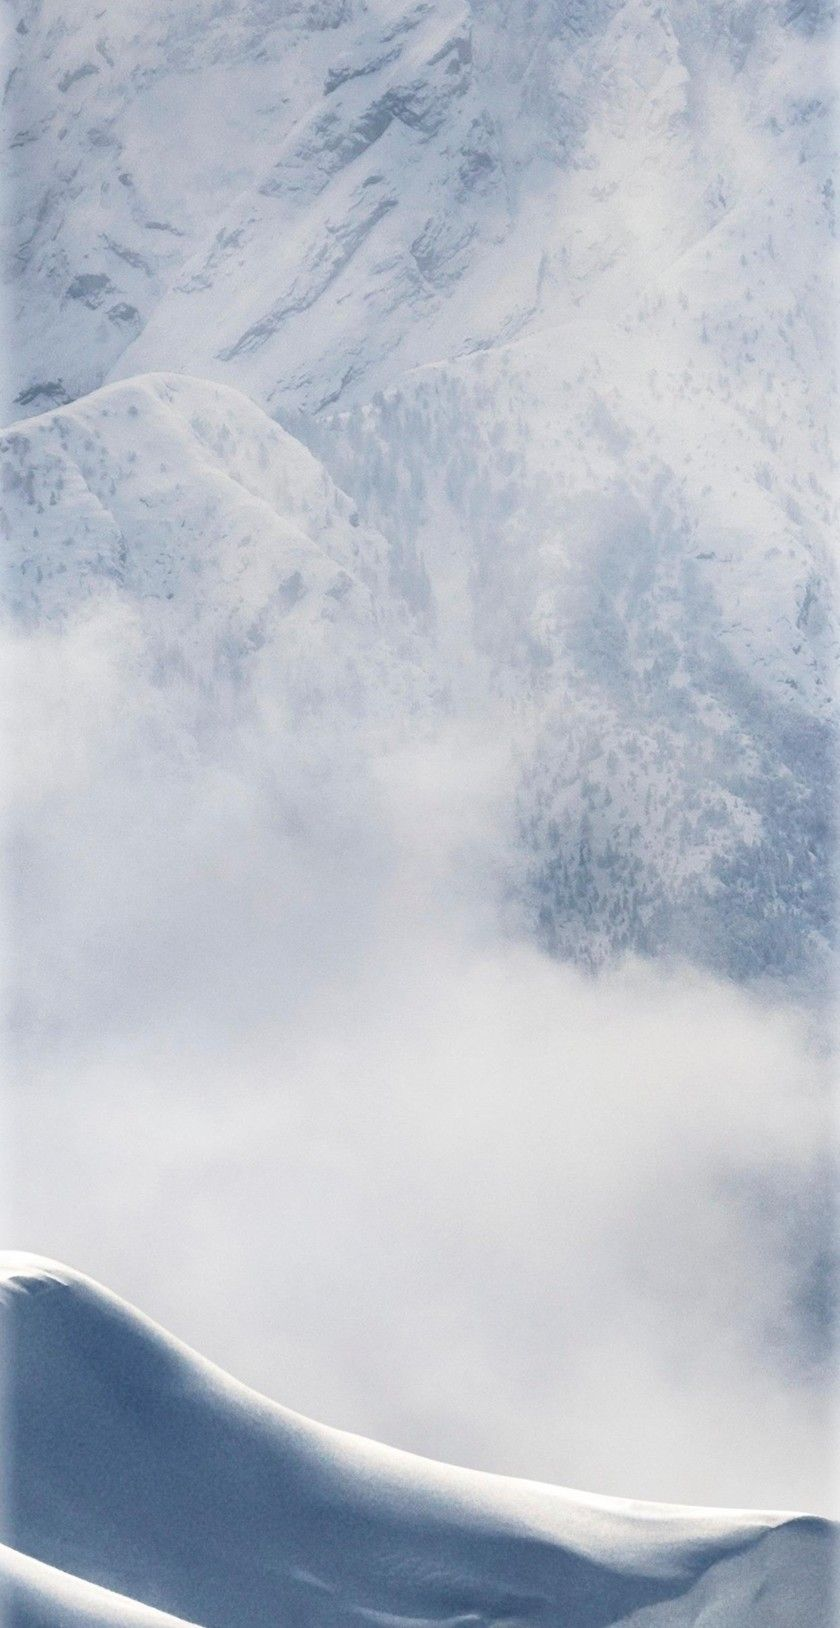 Download Wallpaper Mountain Samsung Galaxy S7 - f826e8689b3bd5e70920a72b4a7e38f2  Photograph_873021.jpg